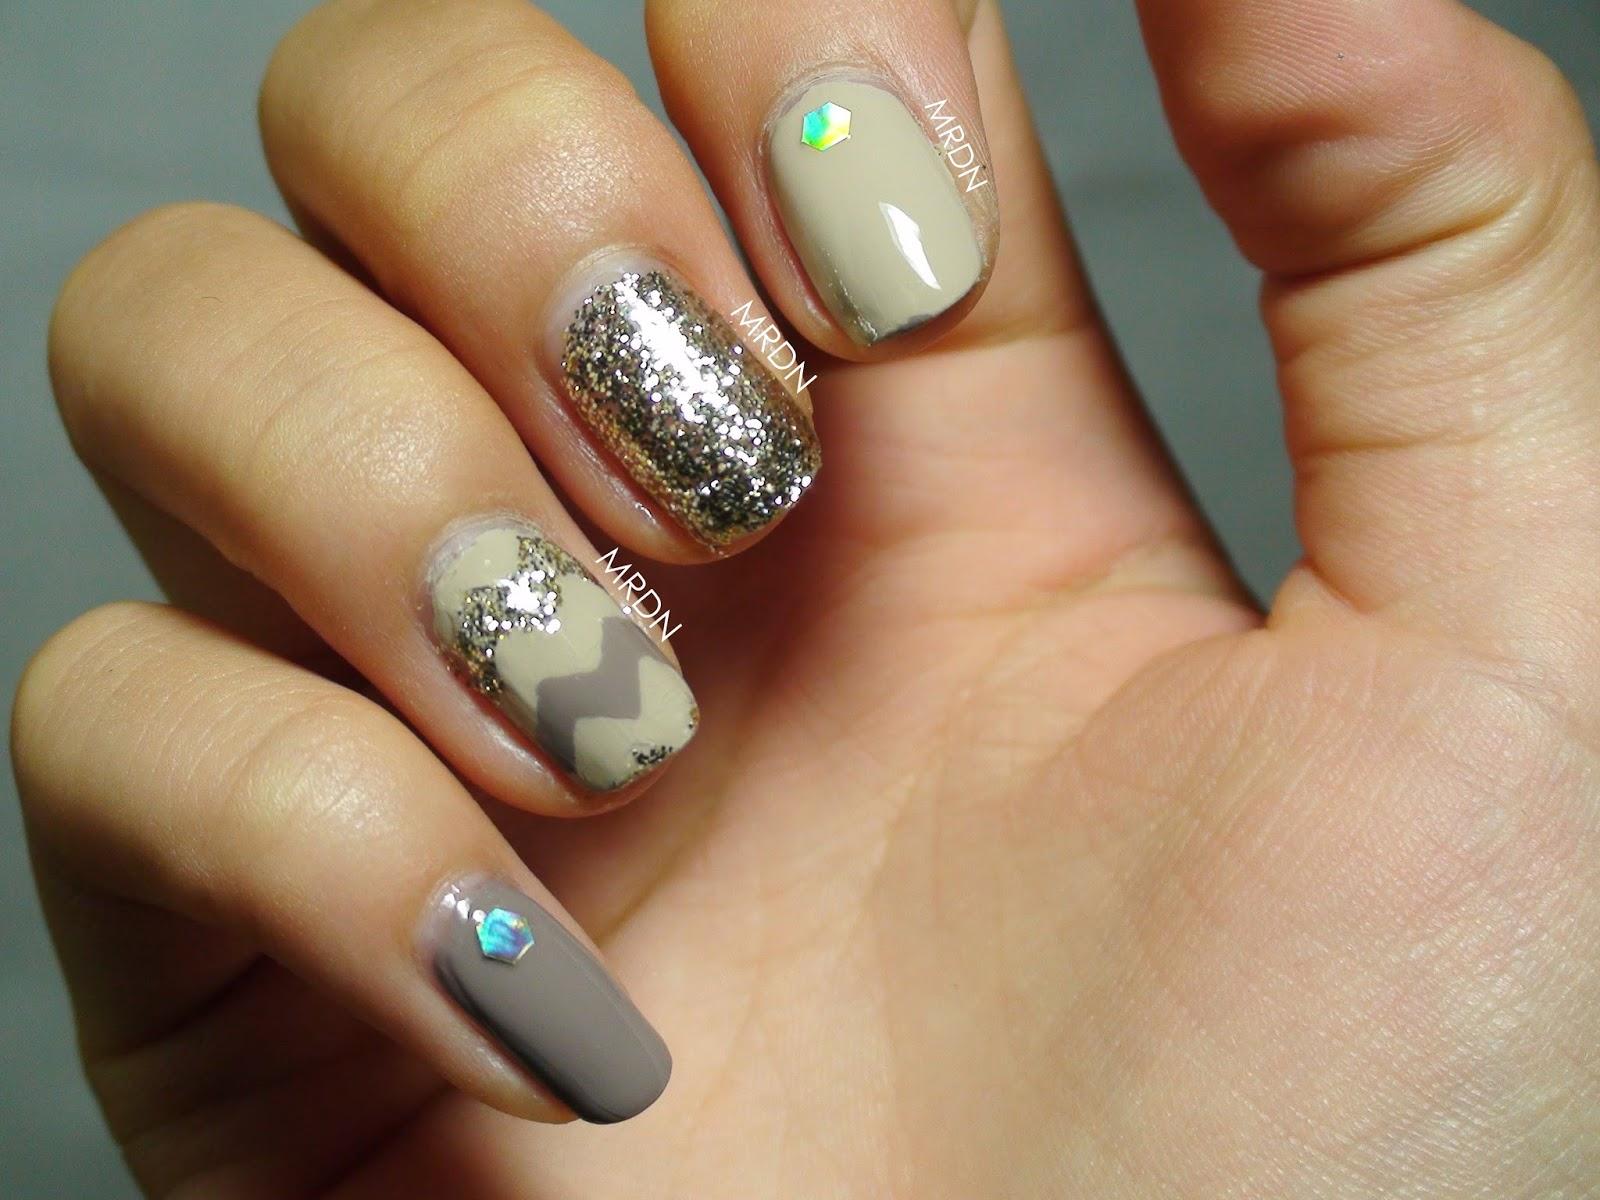 Nail Art Brown Gold: Leopard nail art ideas nenuno creative. Pin by ...